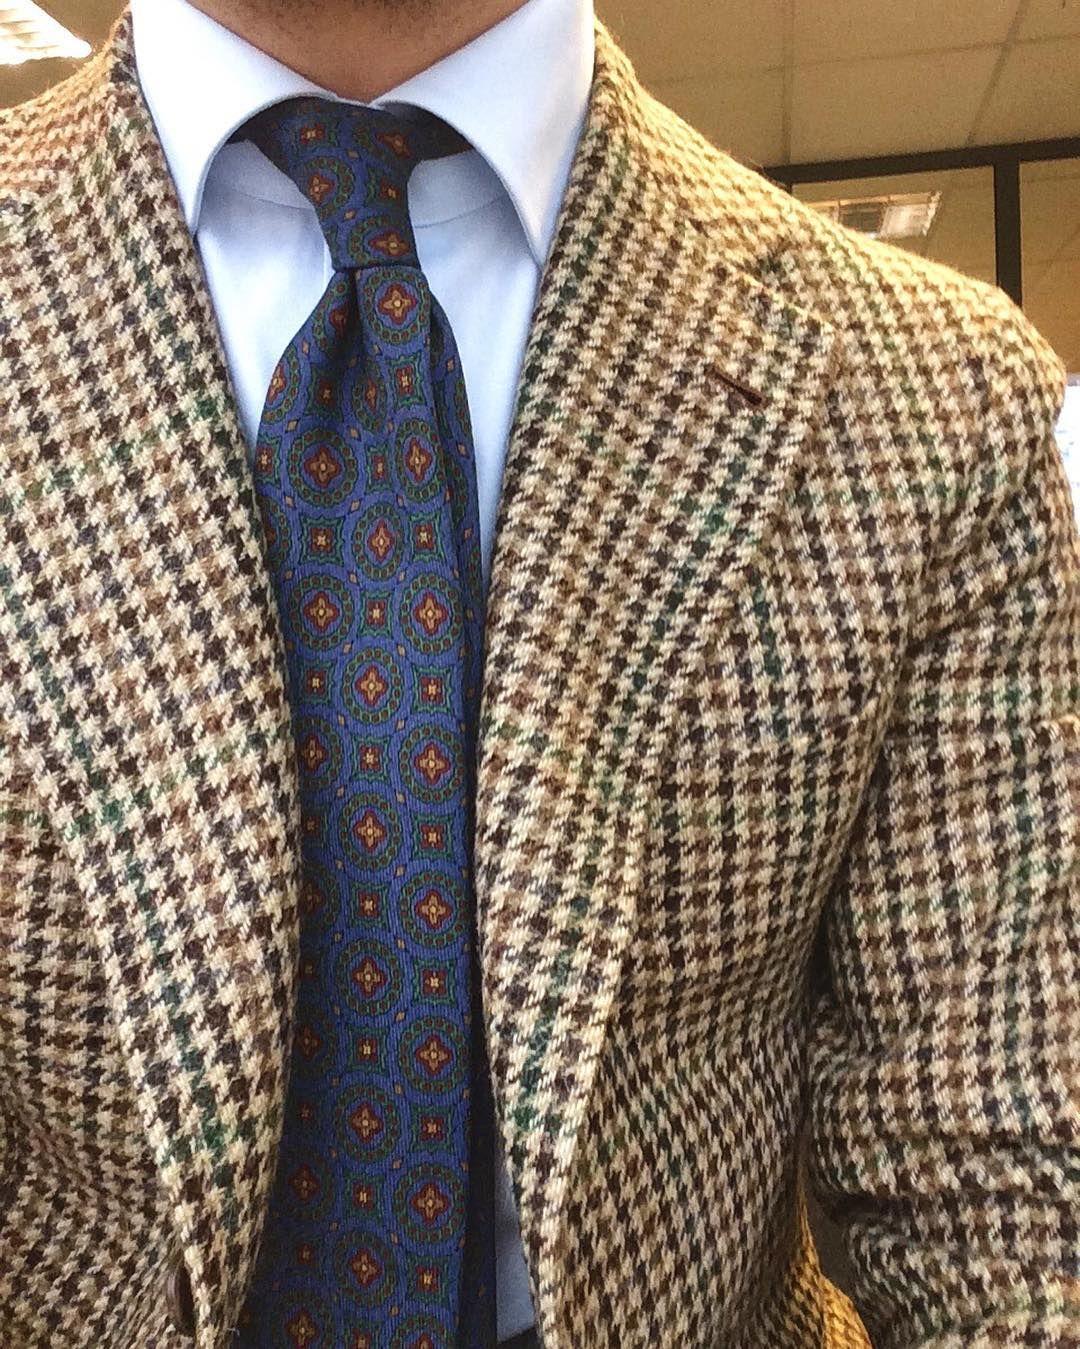 95de6f6455c8 Light brown houndstooth tweed jacket, light blue shirt, blue tie ...